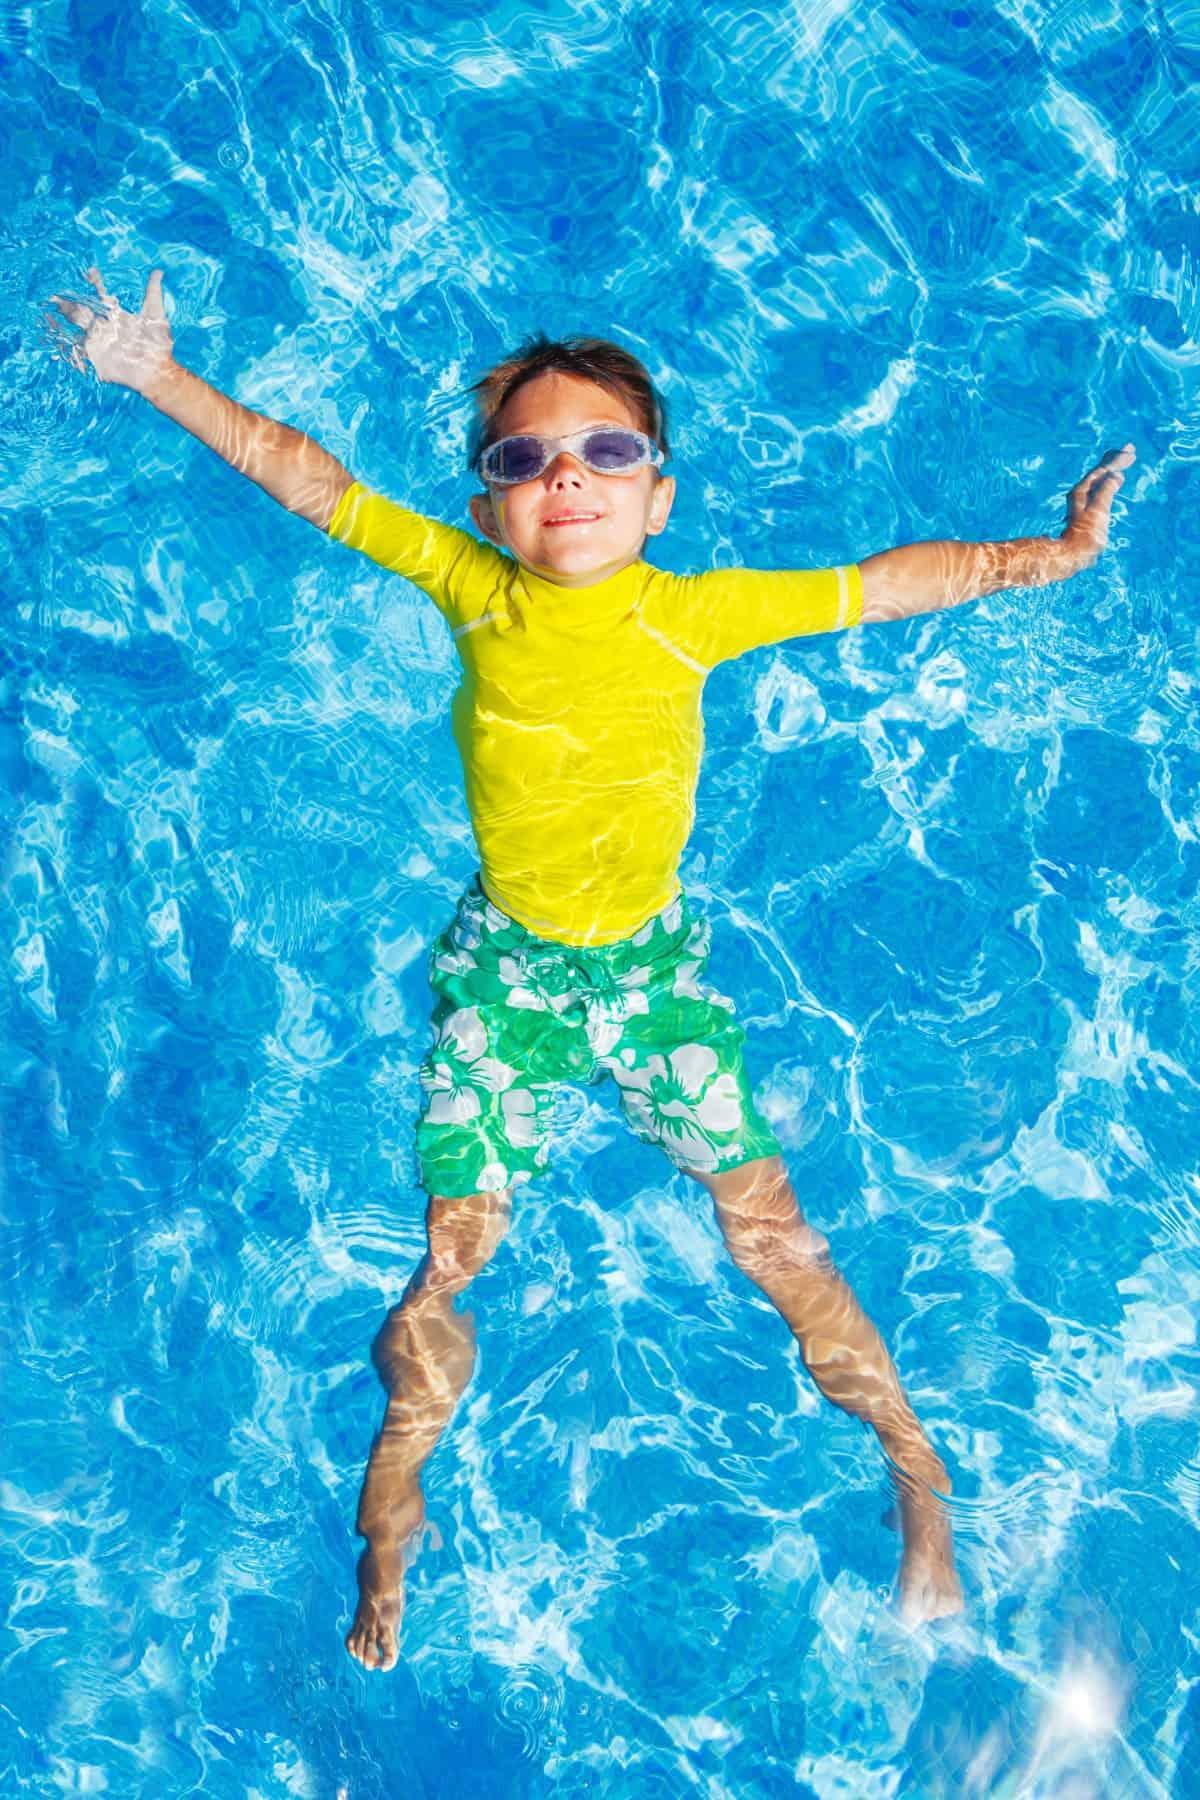 Overhead view of young boy swimming in pool wearing sun protective rash guard